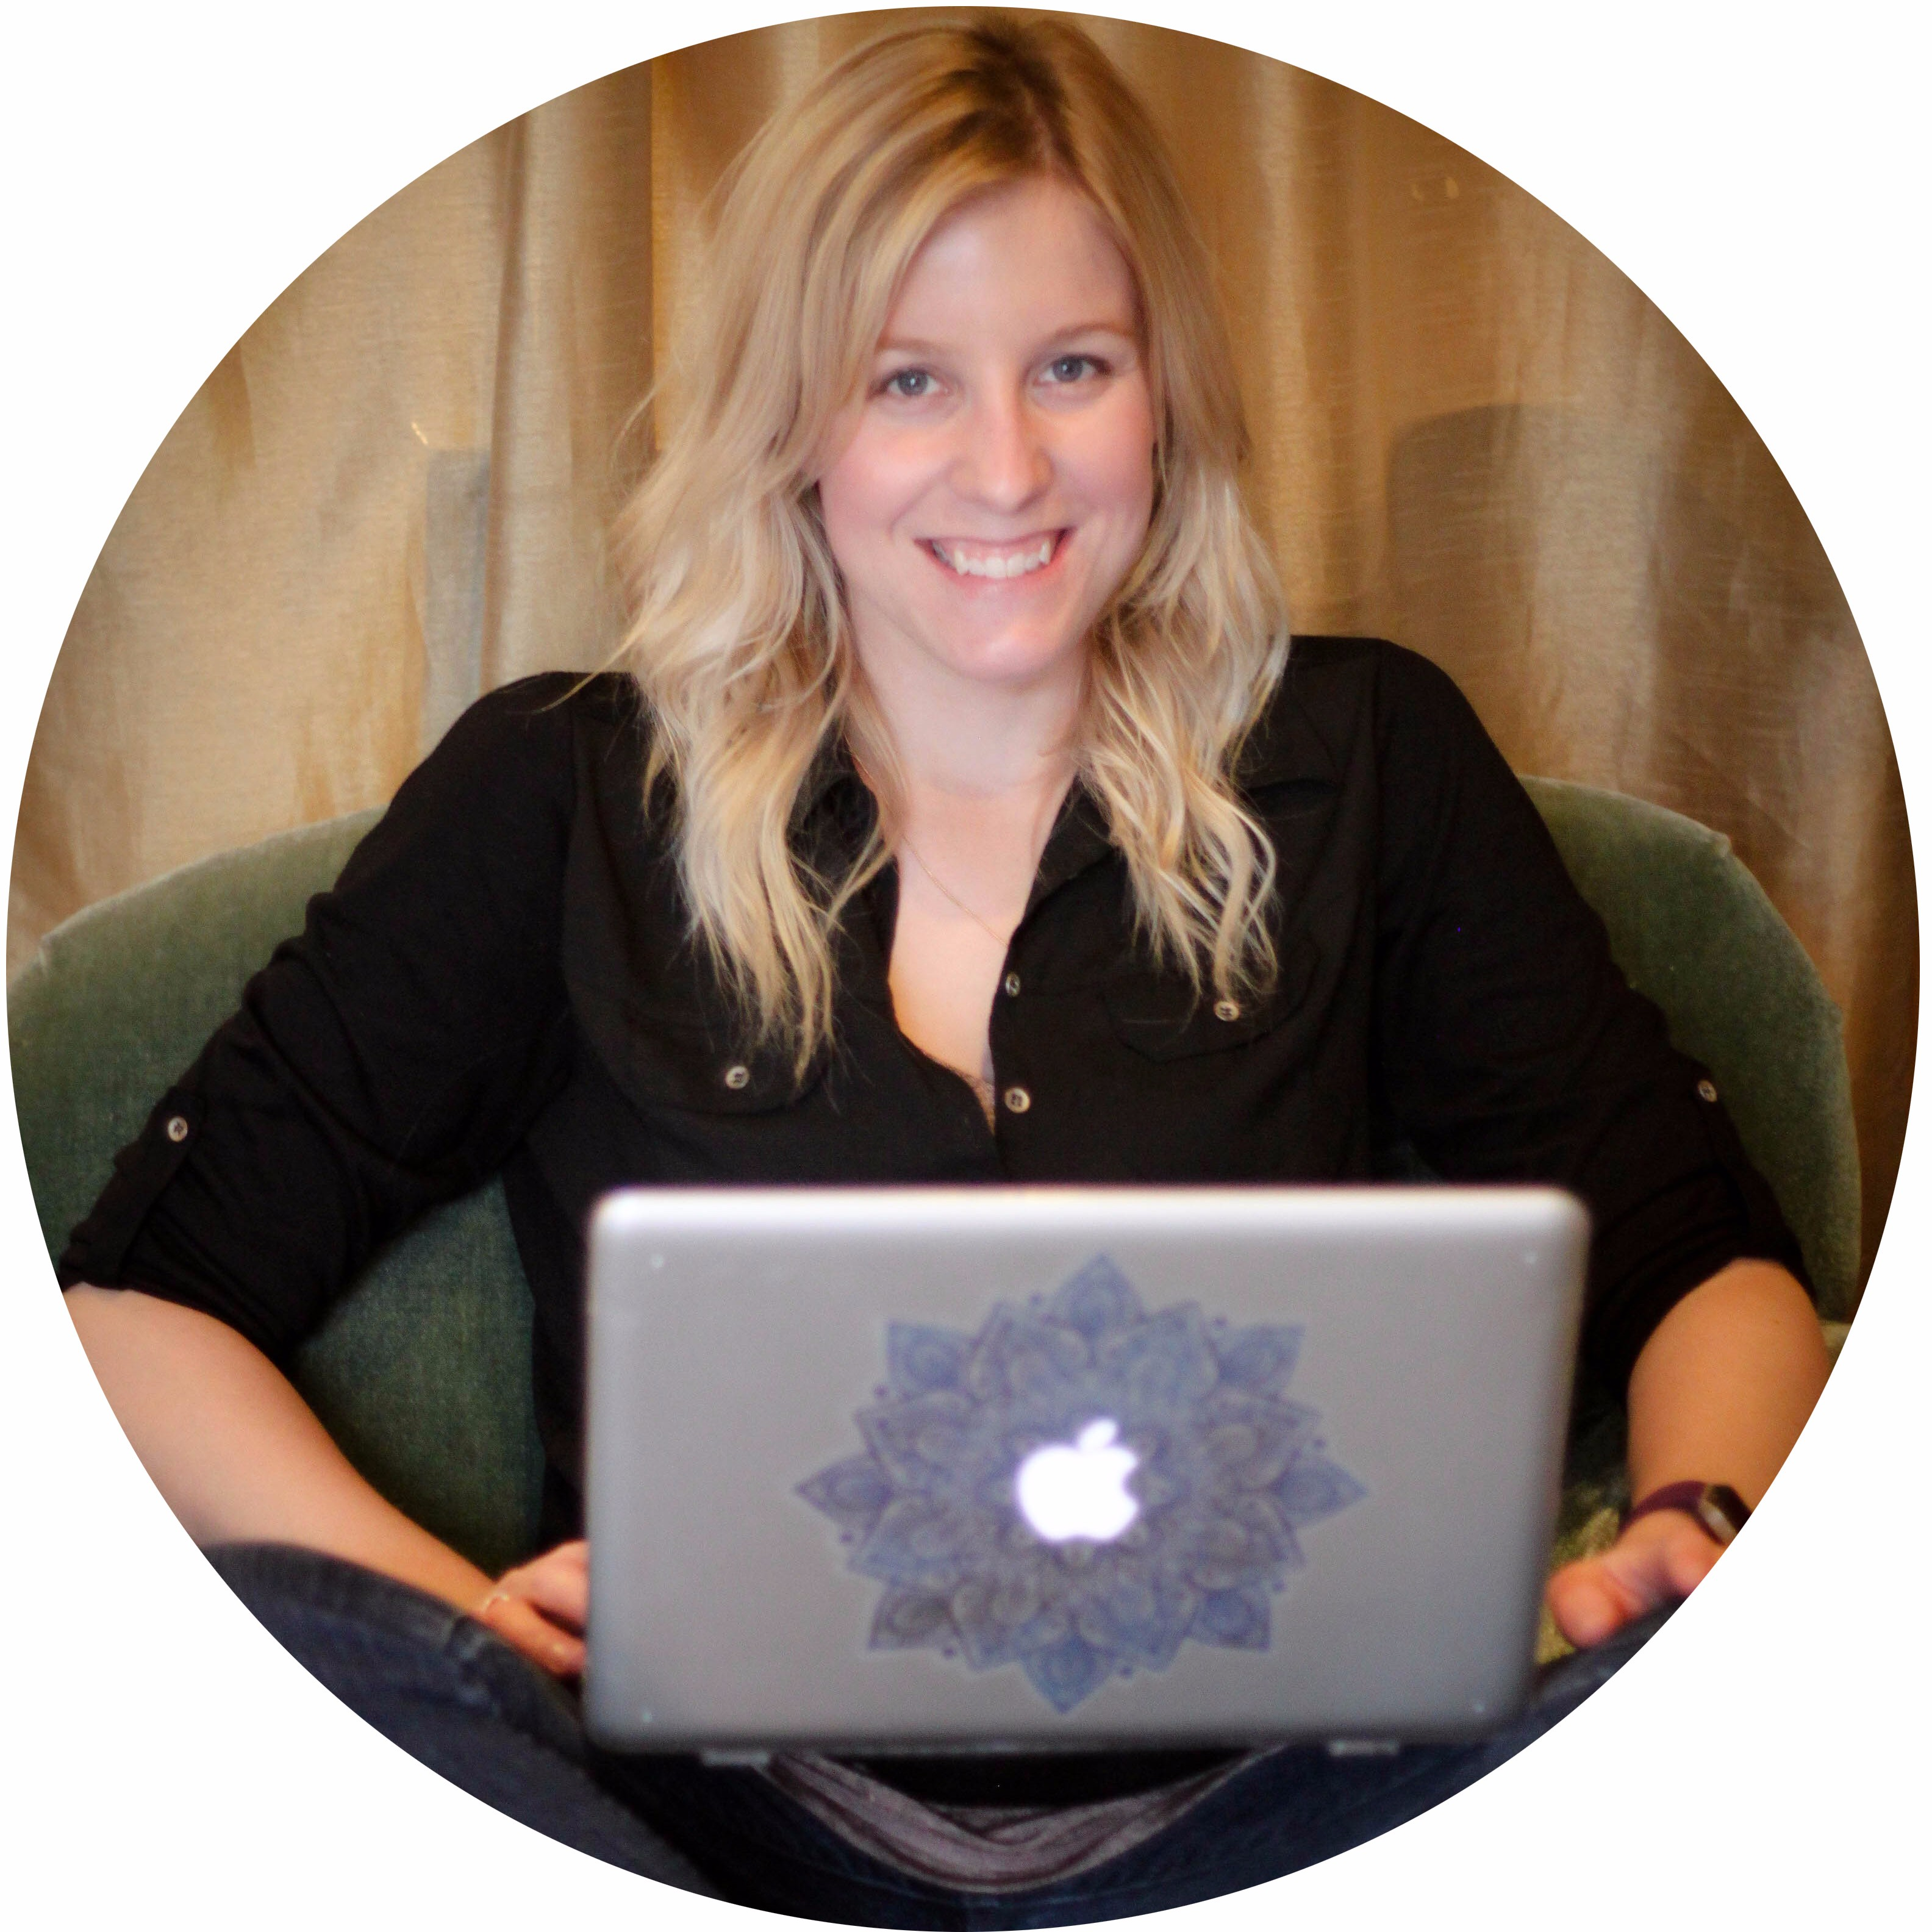 Amy Riordan